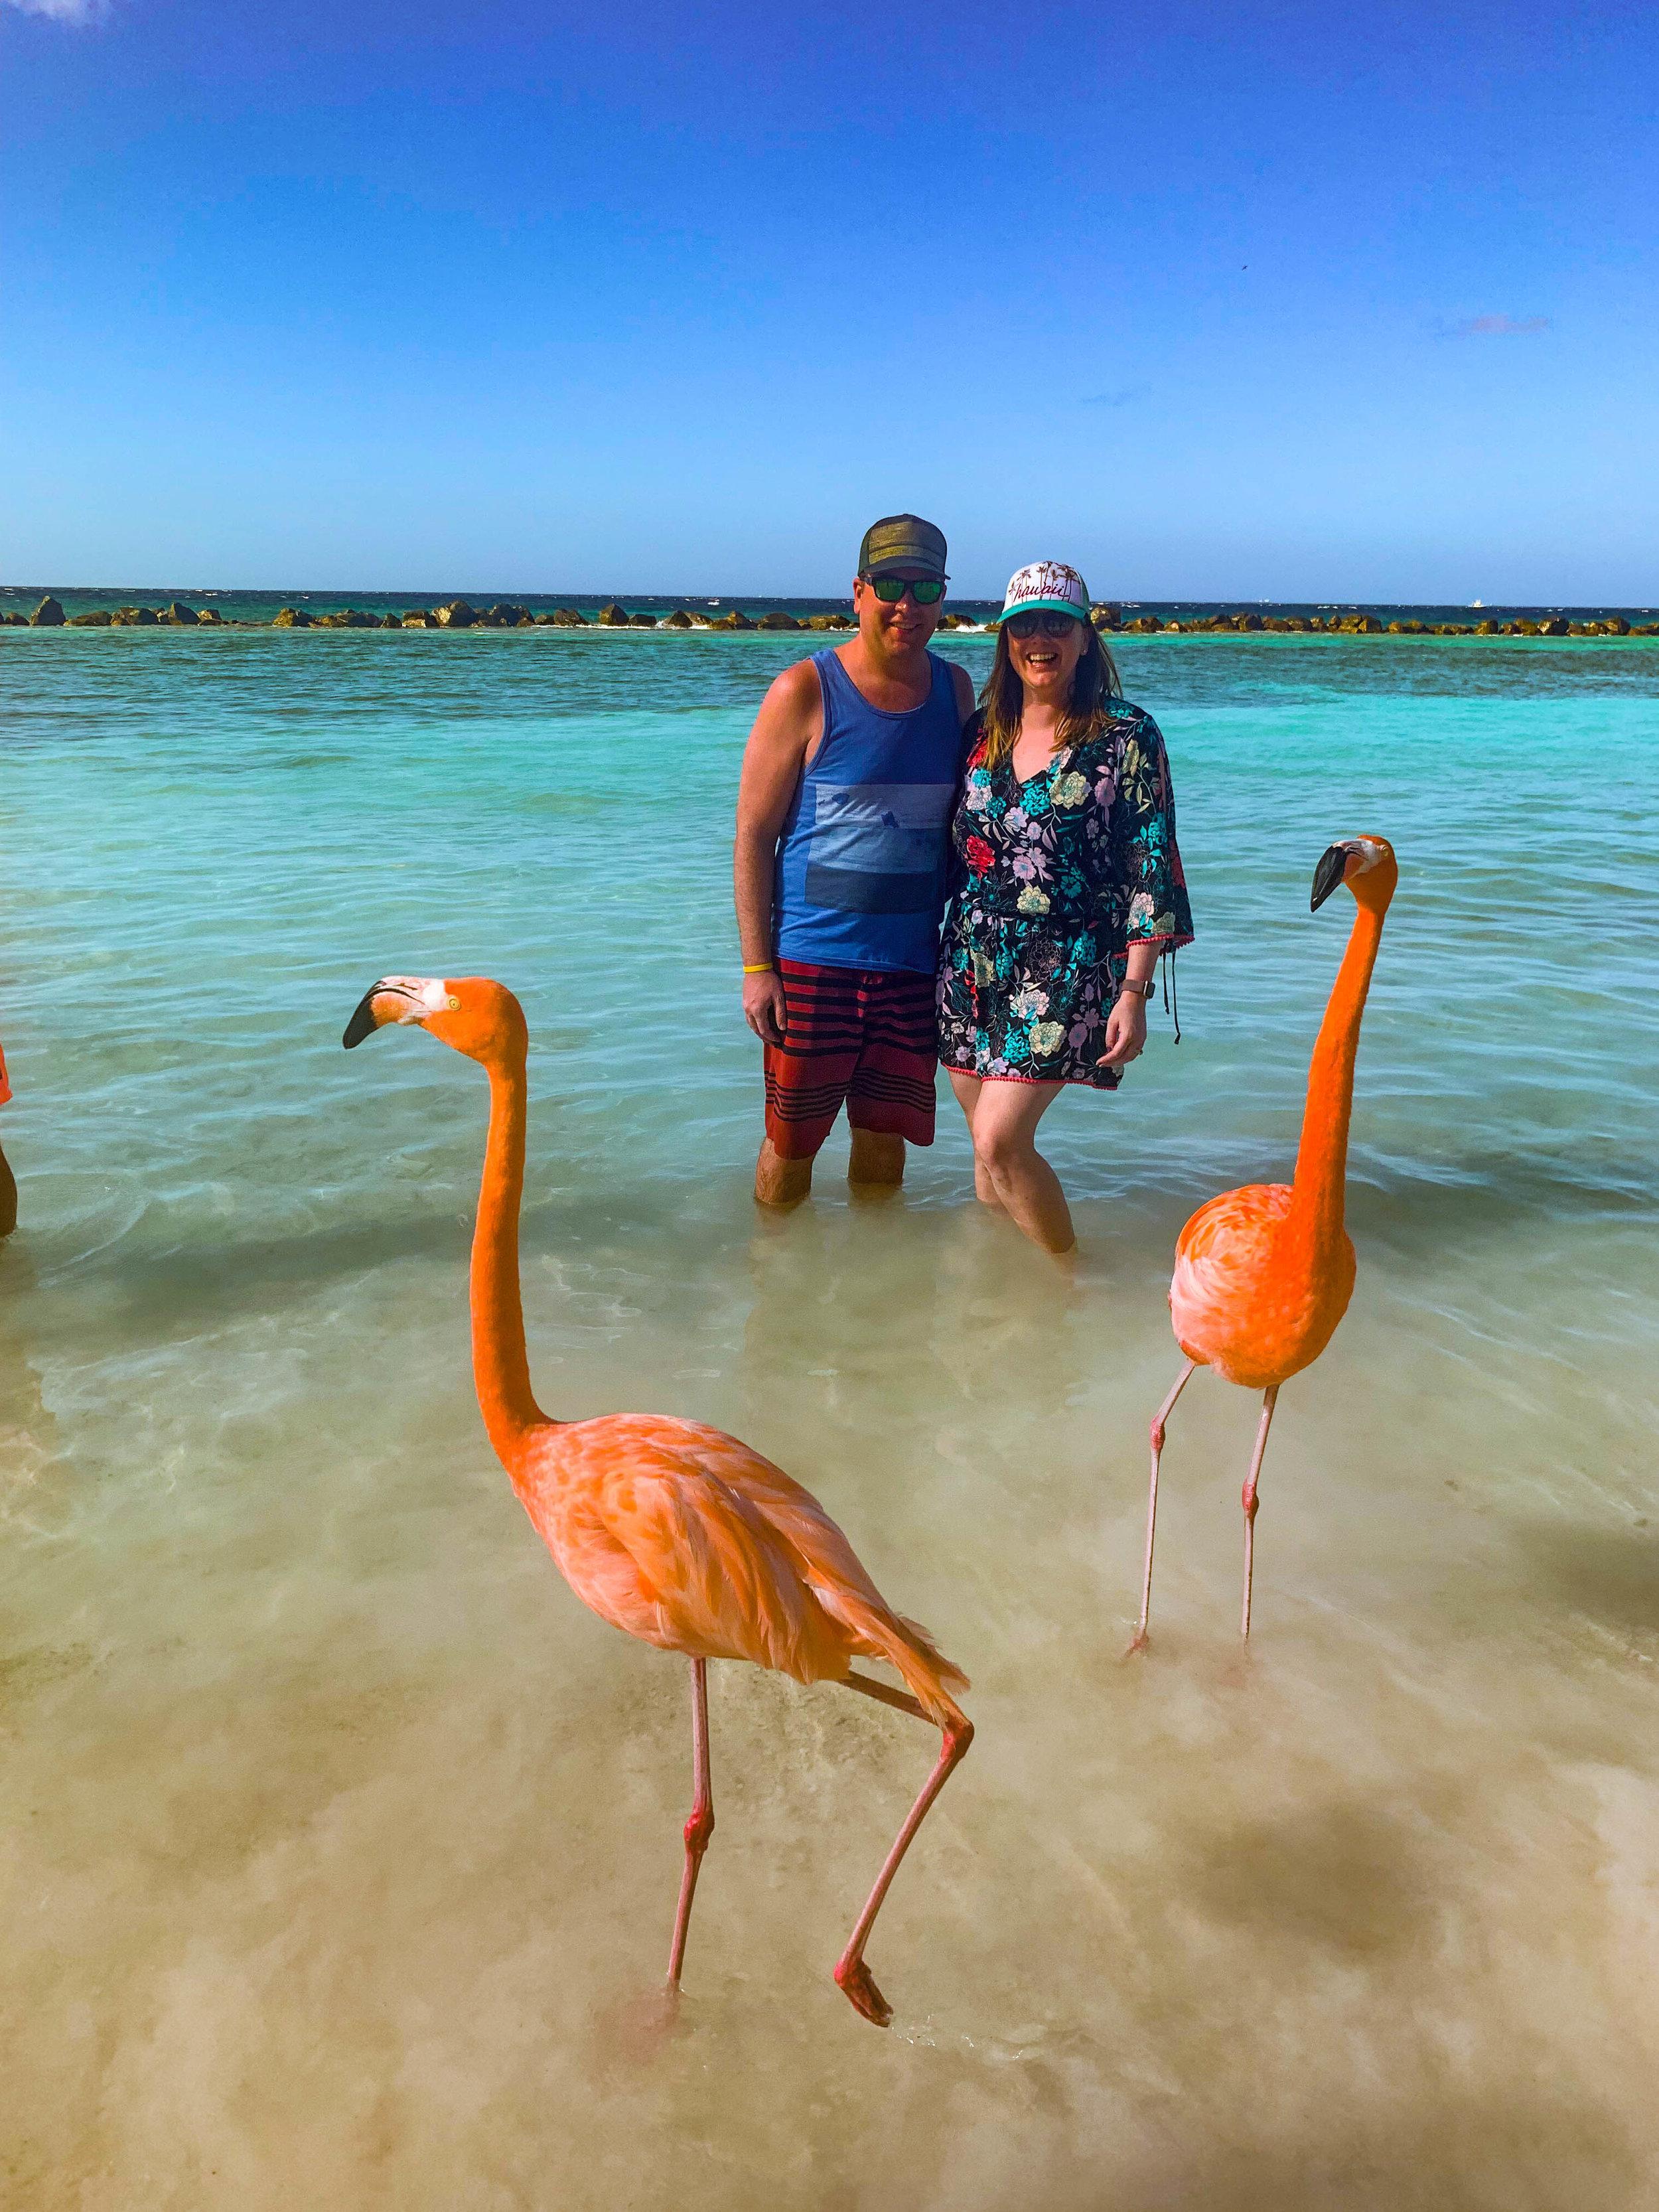 Aruba_Flamingo_Renaissance_Island.jpg